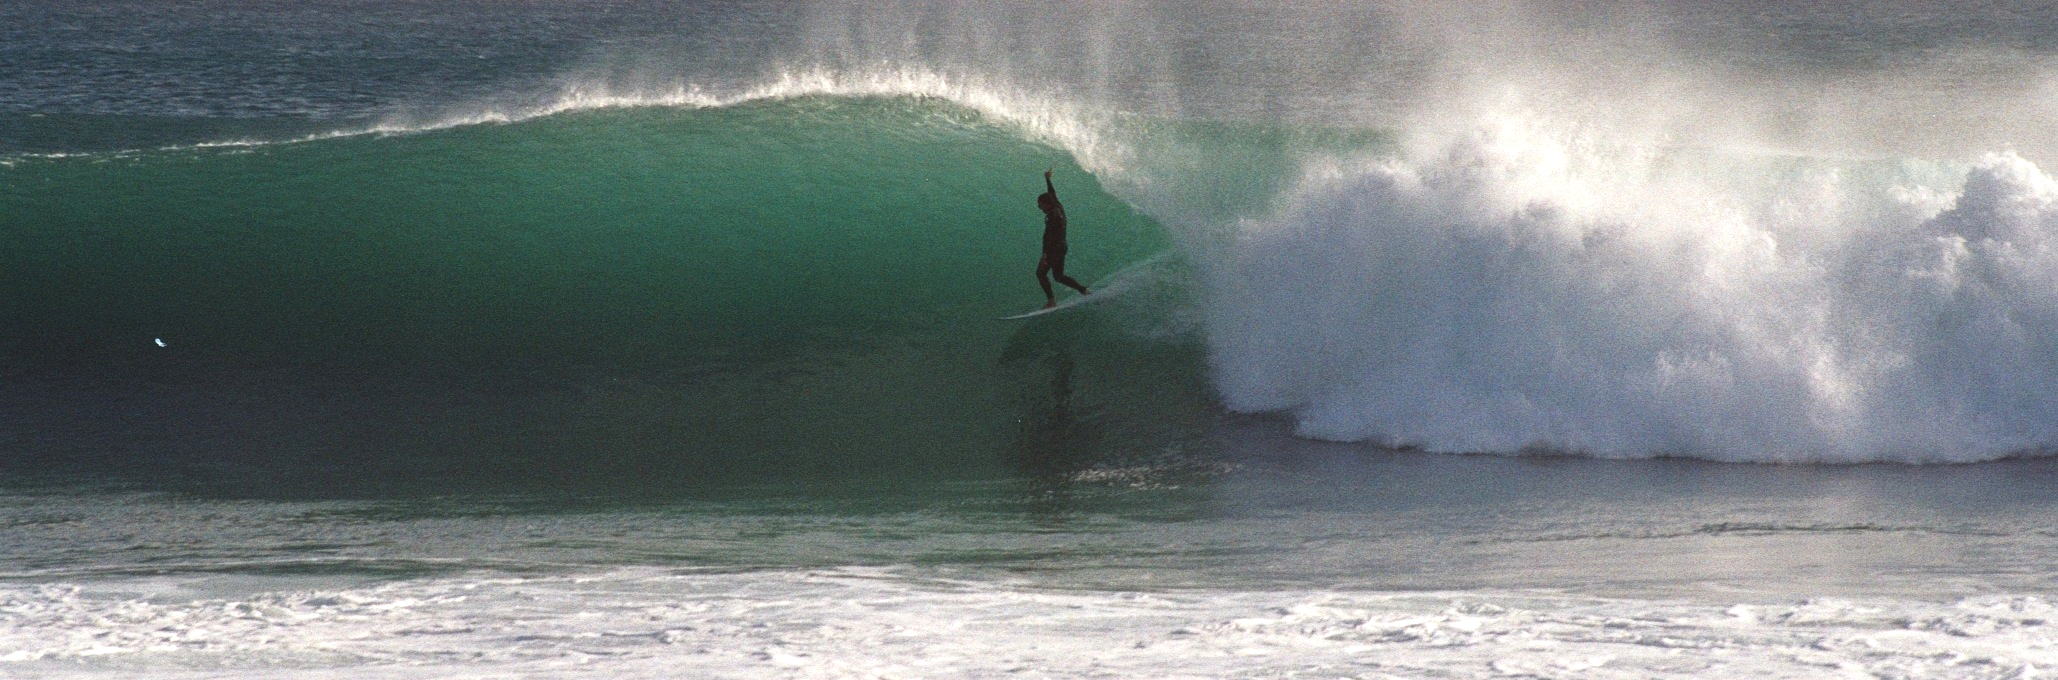 Photo by Joyas surf center